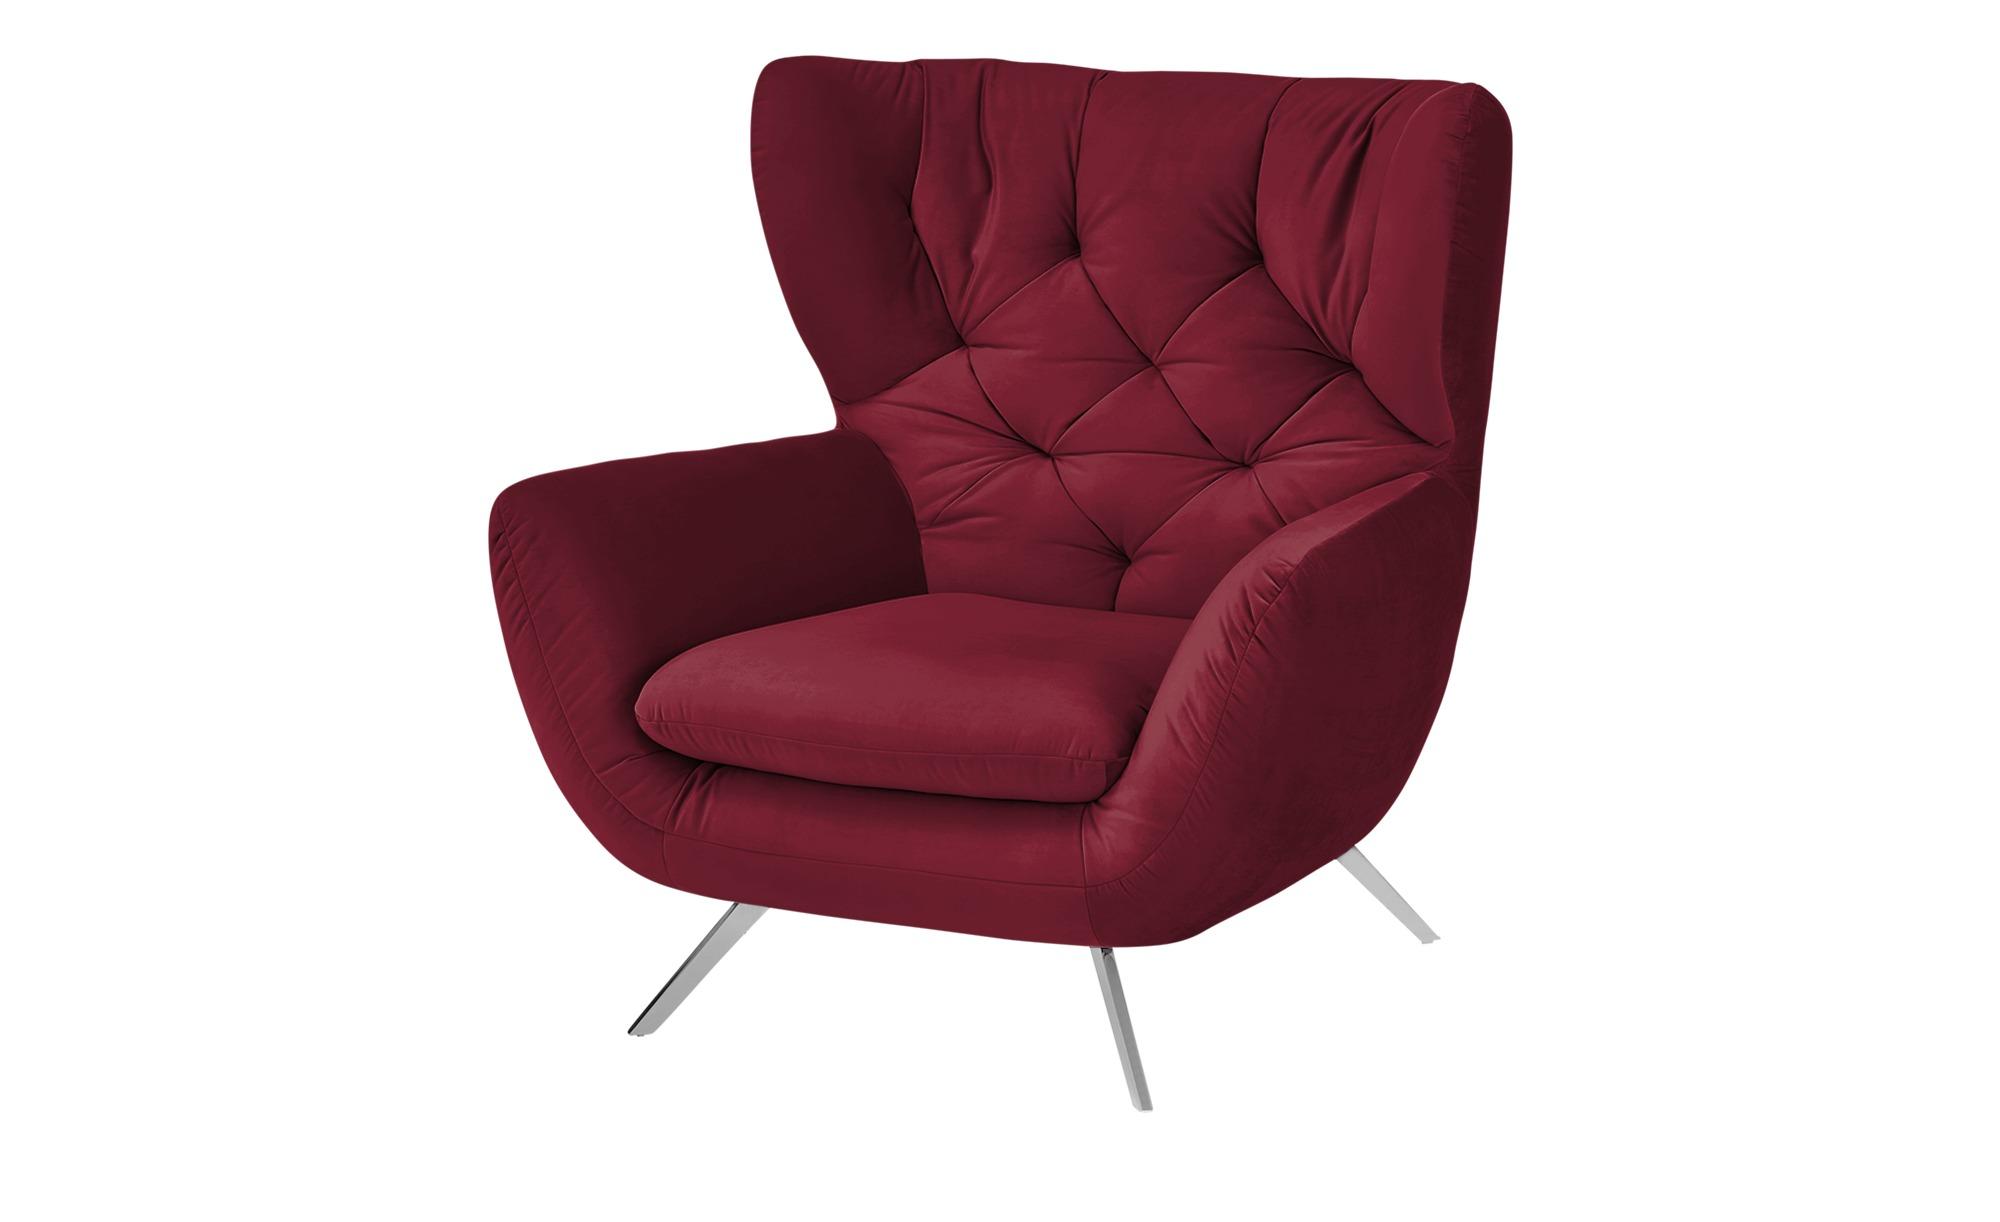 pop Hochlehnsessel  Caldara ¦ rot ¦ Maße (cm): B: 100 H: 106 T: 95 Polstermöbel > Sessel > Ohrensessel - Höffner